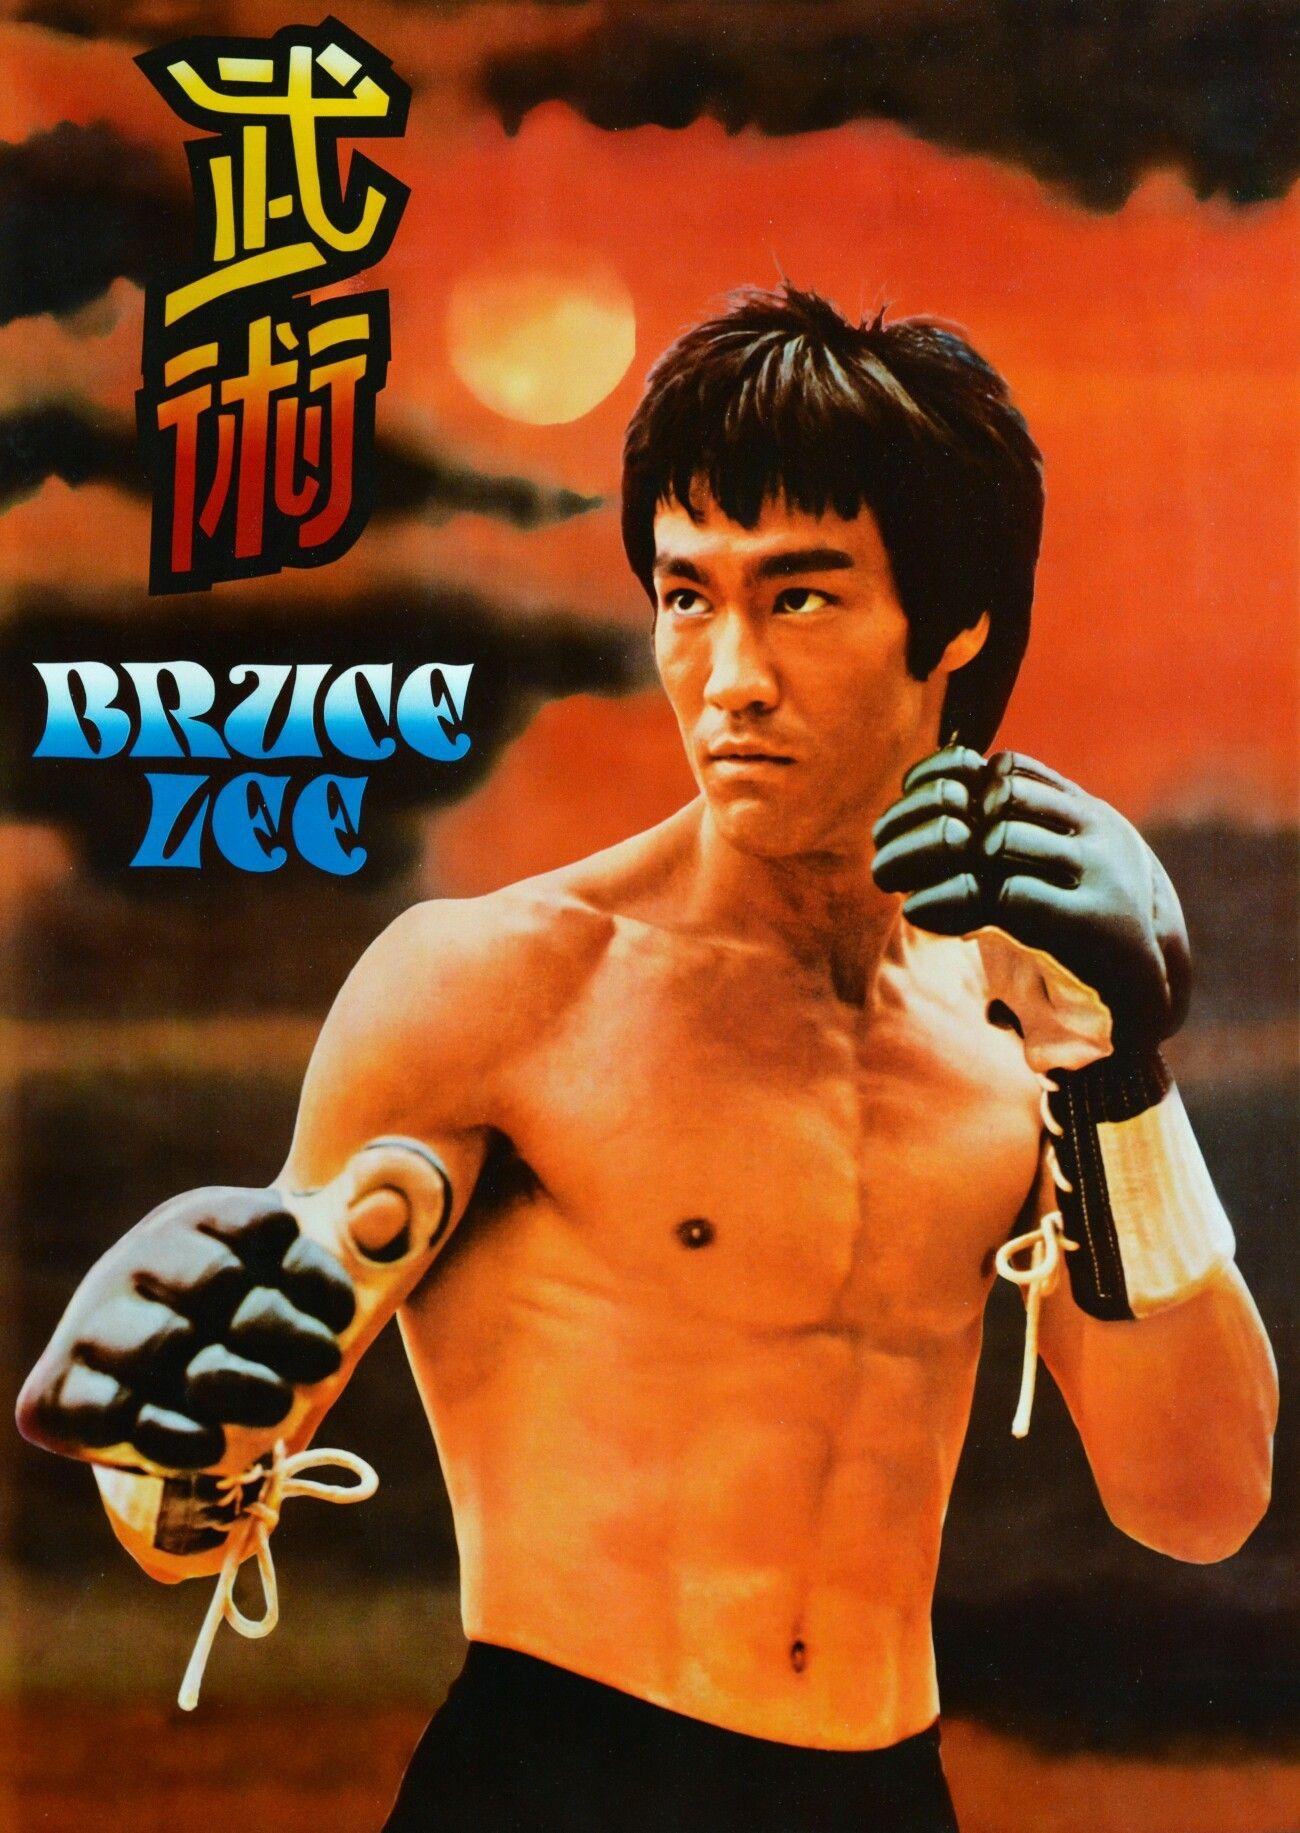 Pin De Alan Em Bruce Imagens Art Bruce Lee Marcial Lee